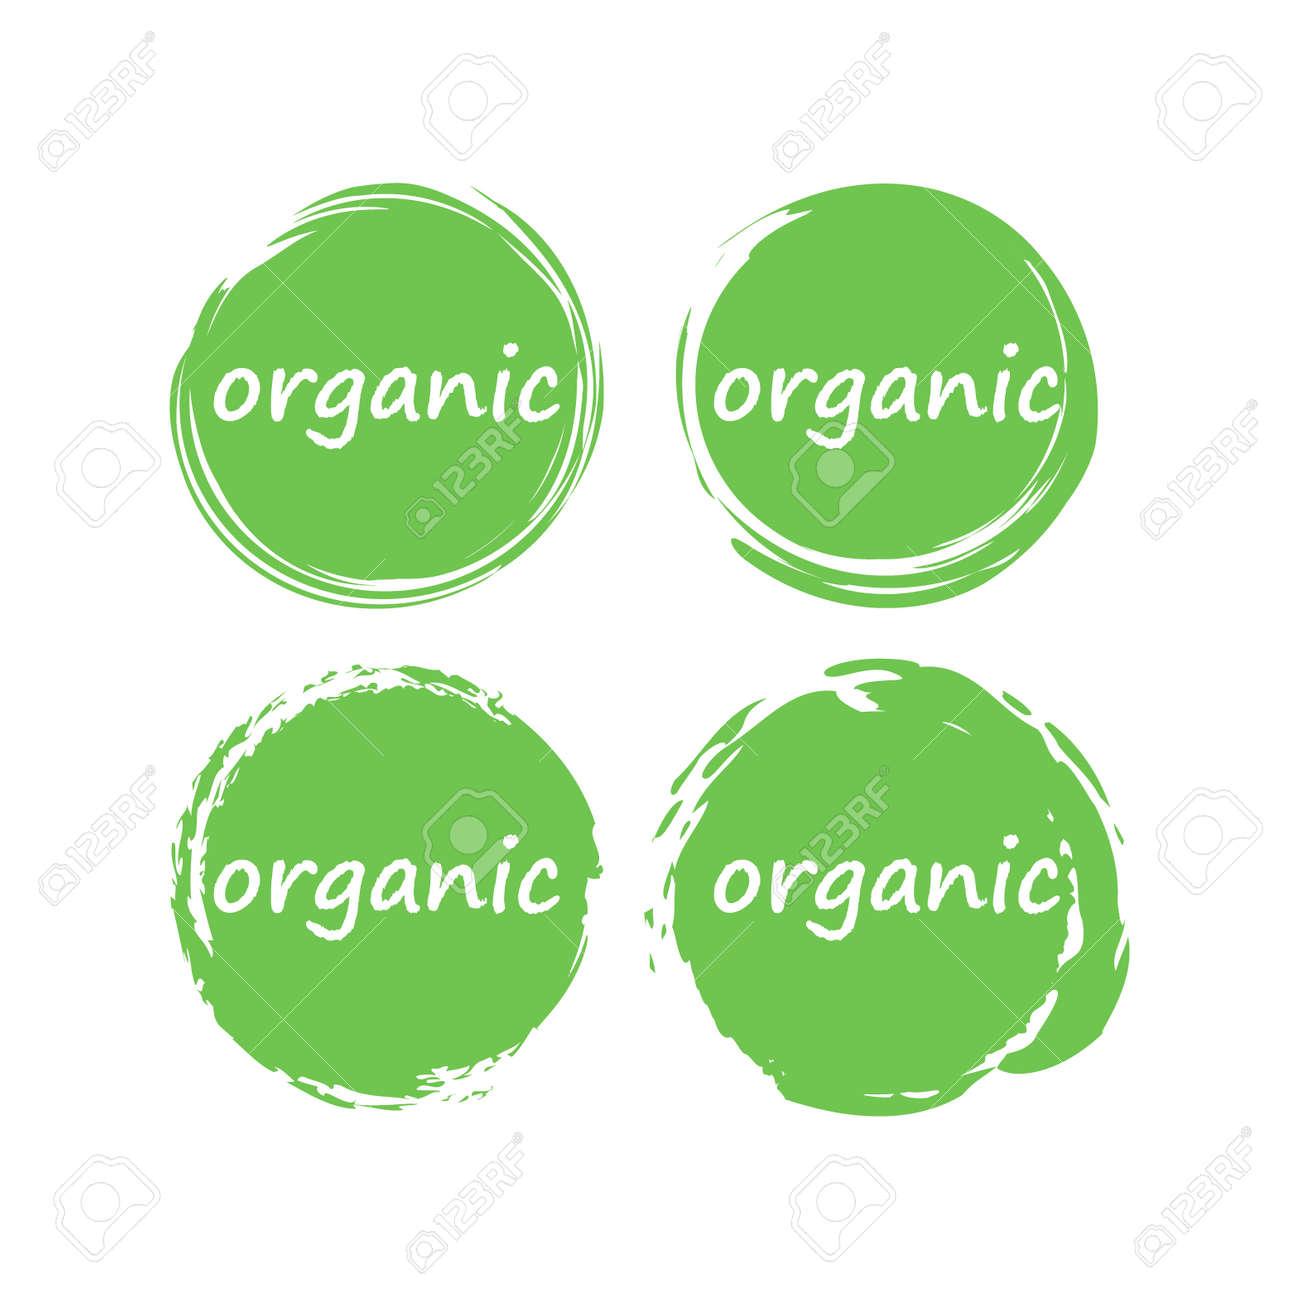 Organic food or product vector stamp. Circle dry brush organic label. - 143171297